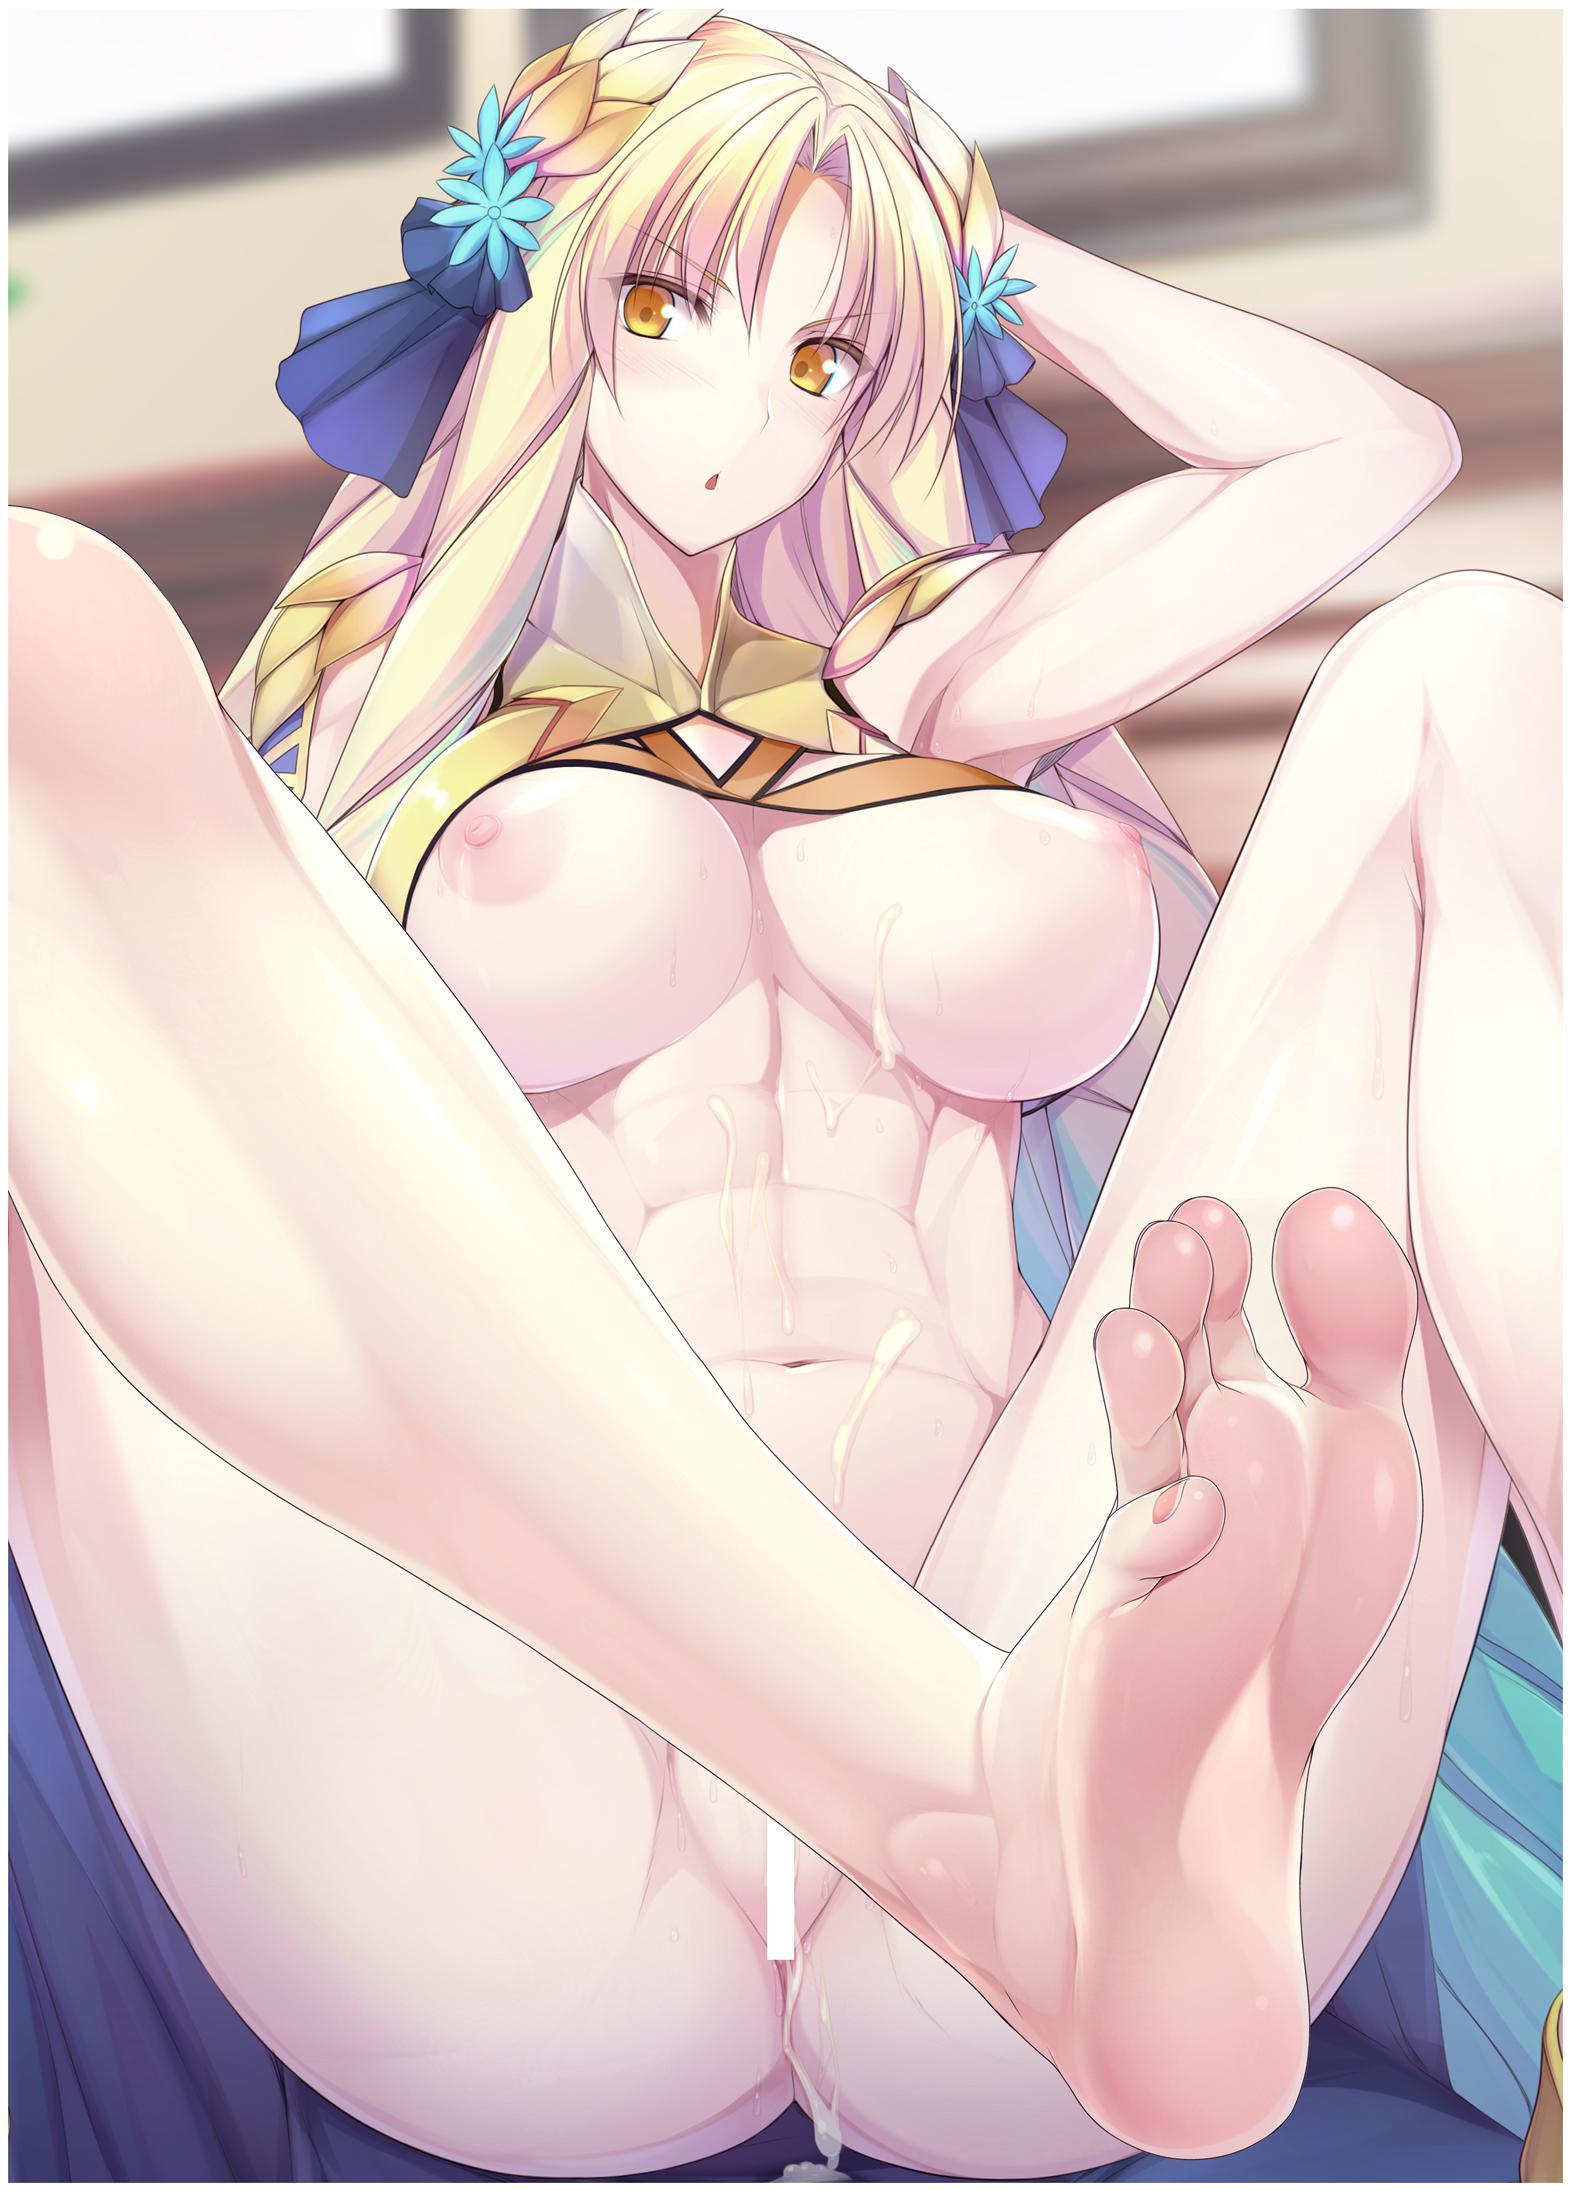 【FGO】アストライア(ルヴィア)の足フェチ二次エロ画像【Fate/GrandOrder】